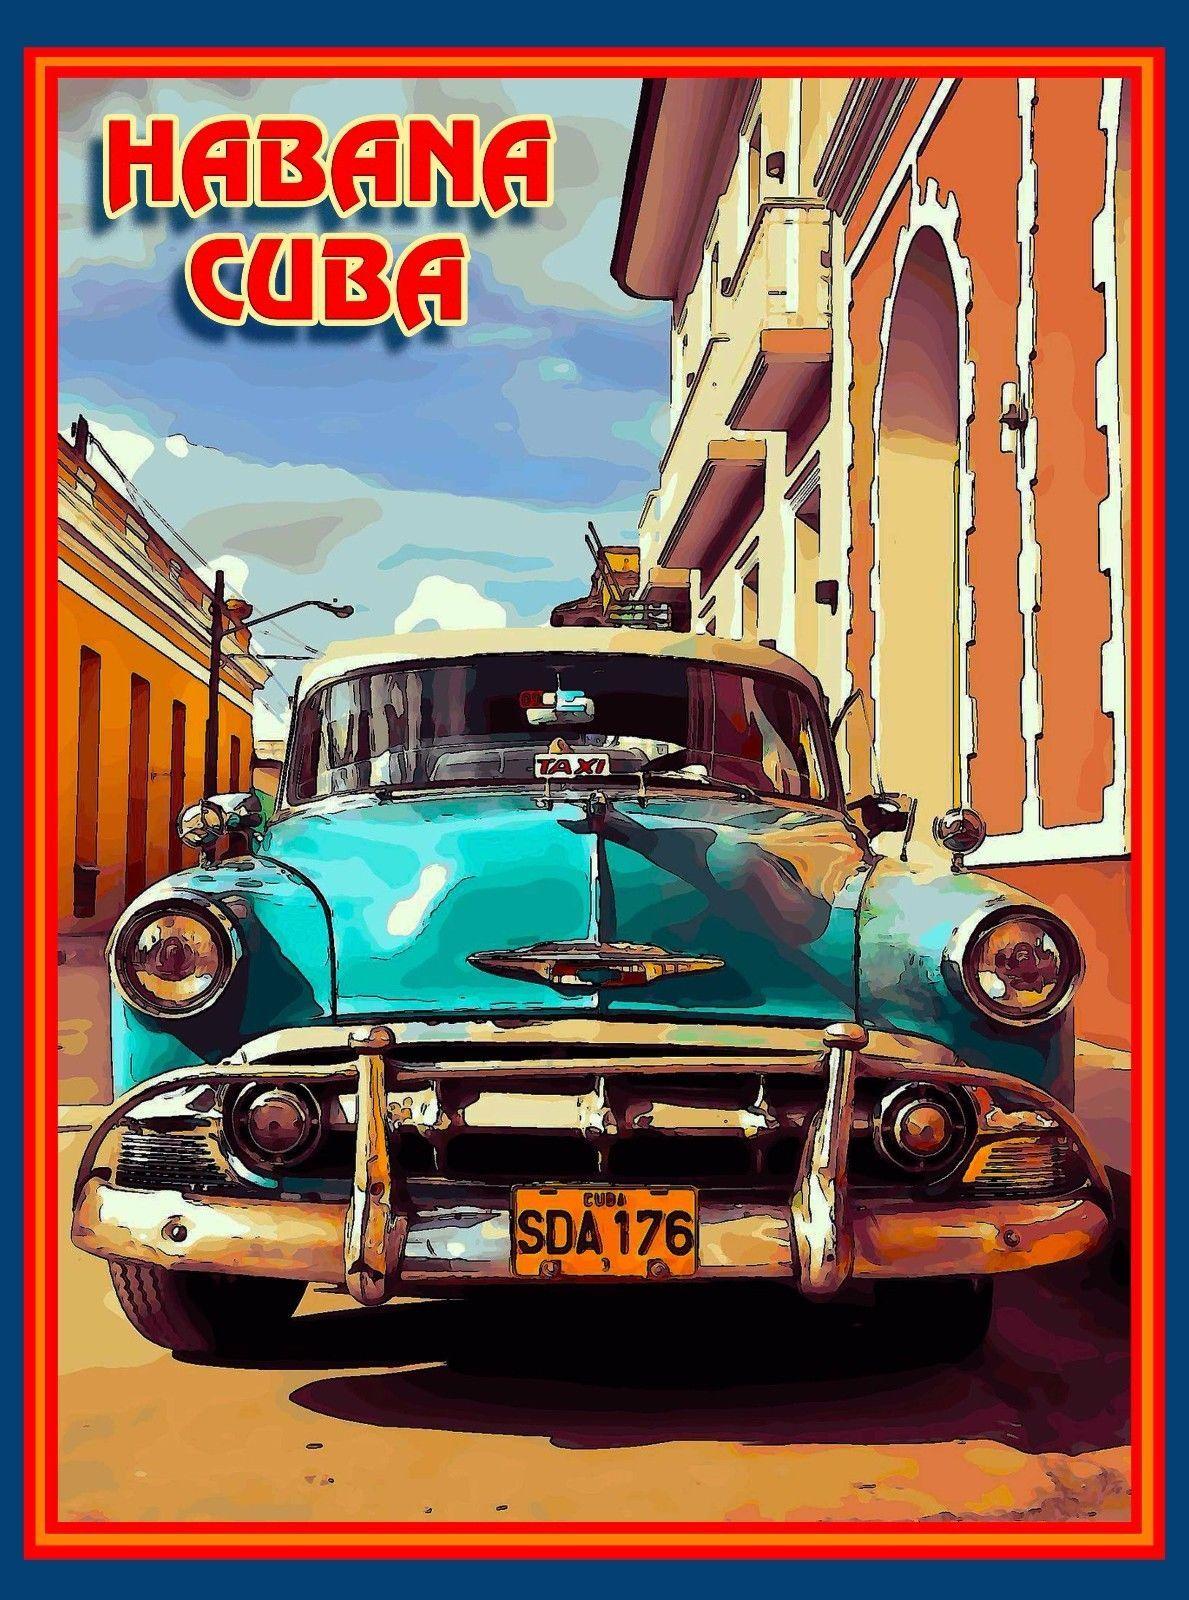 Cuba Cuban Havana Island Habana Caribbean Travel Art